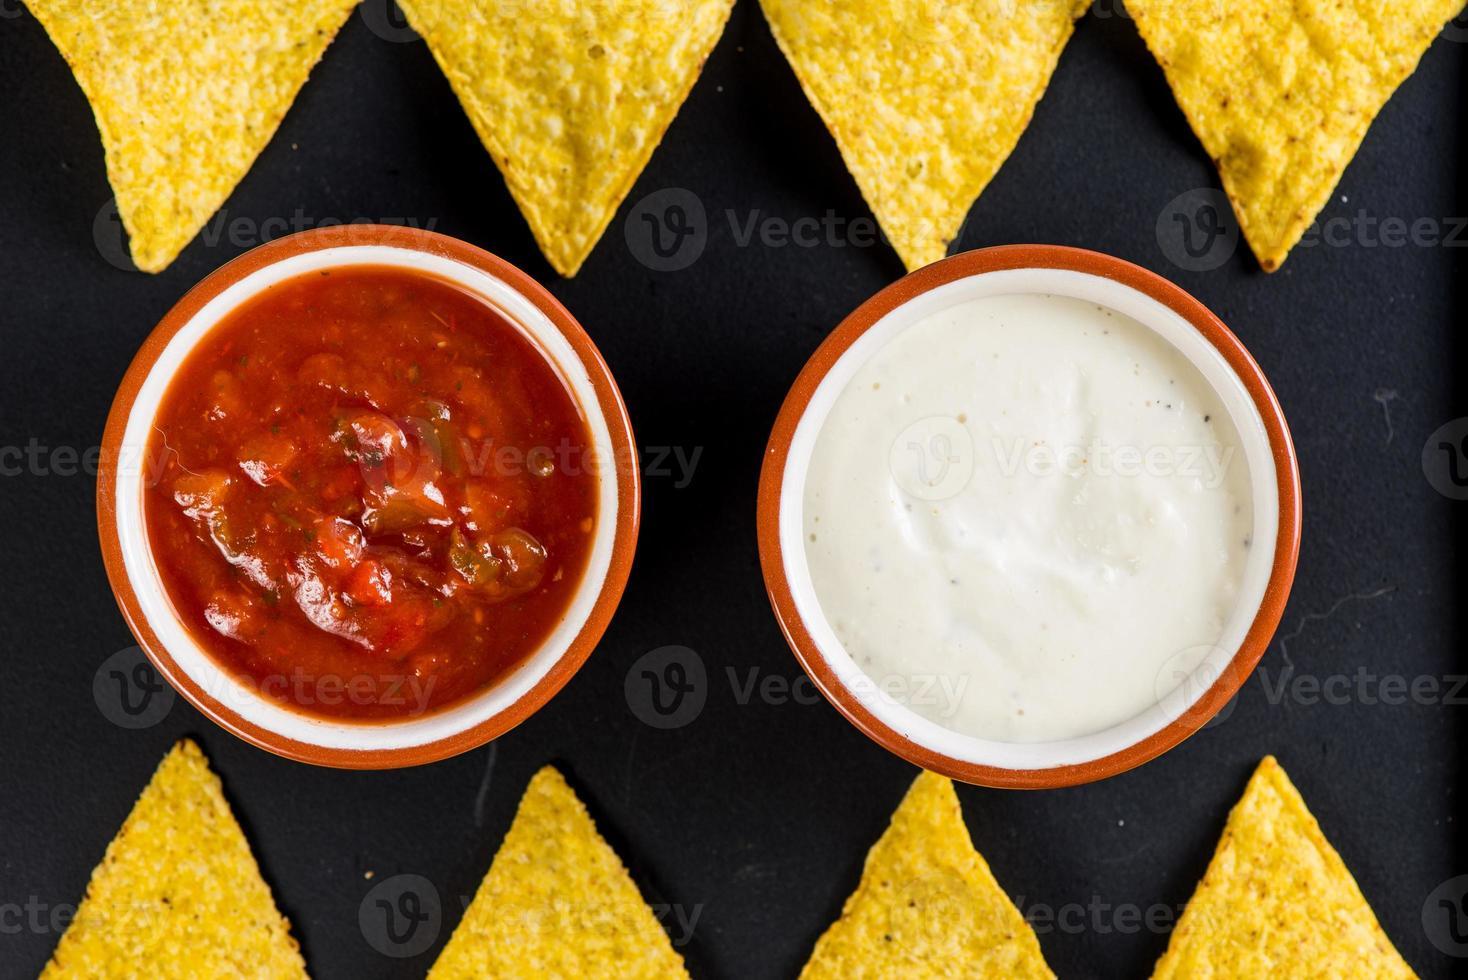 Mexicaanse nacho's met salsa foto